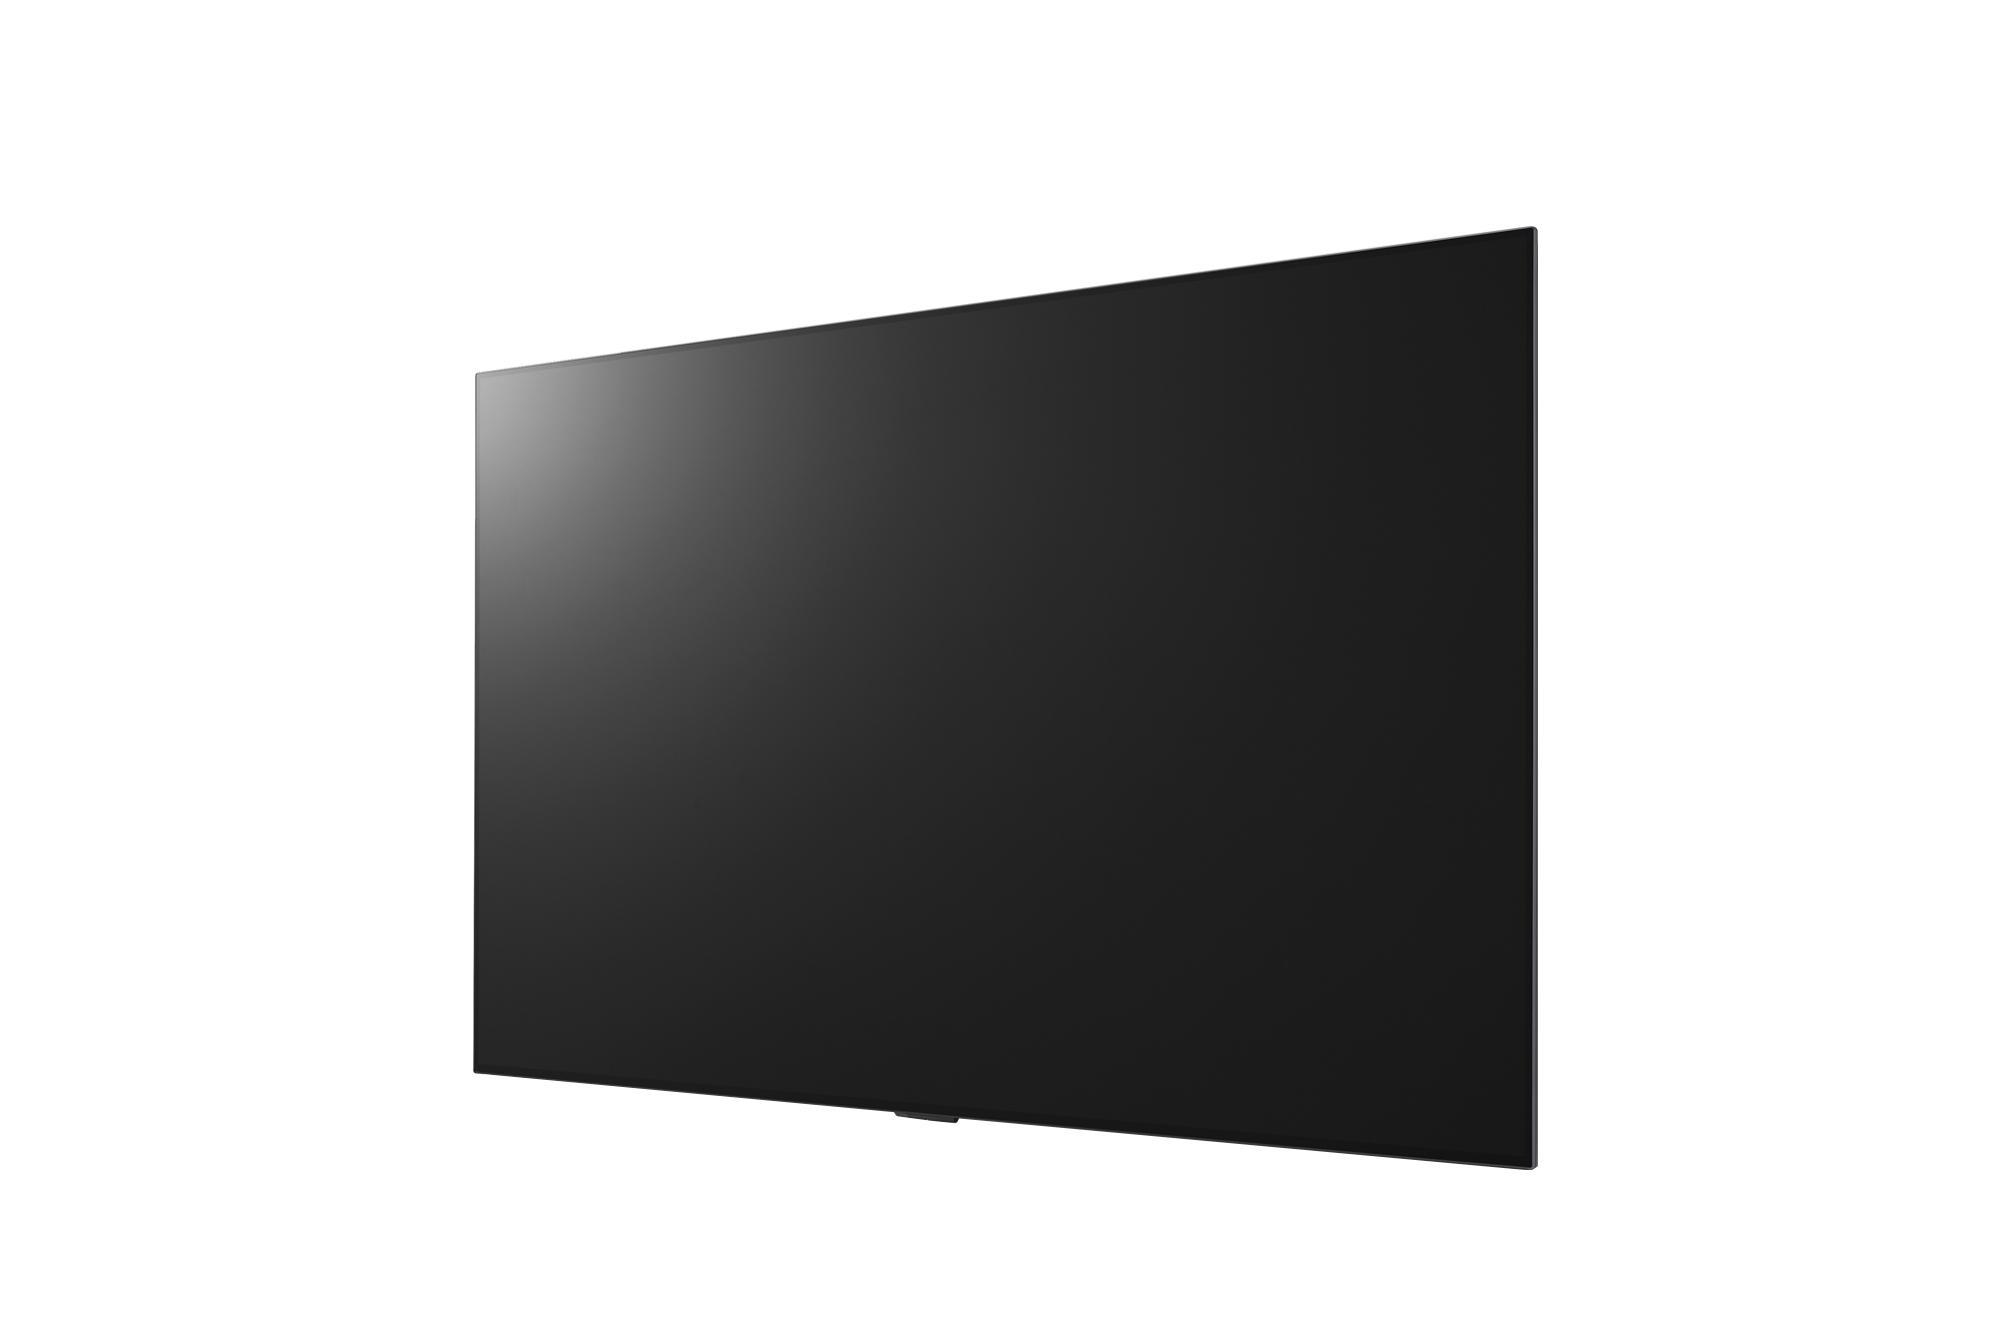 LG Pro:Centric SMART 65WS960H (EU) 4